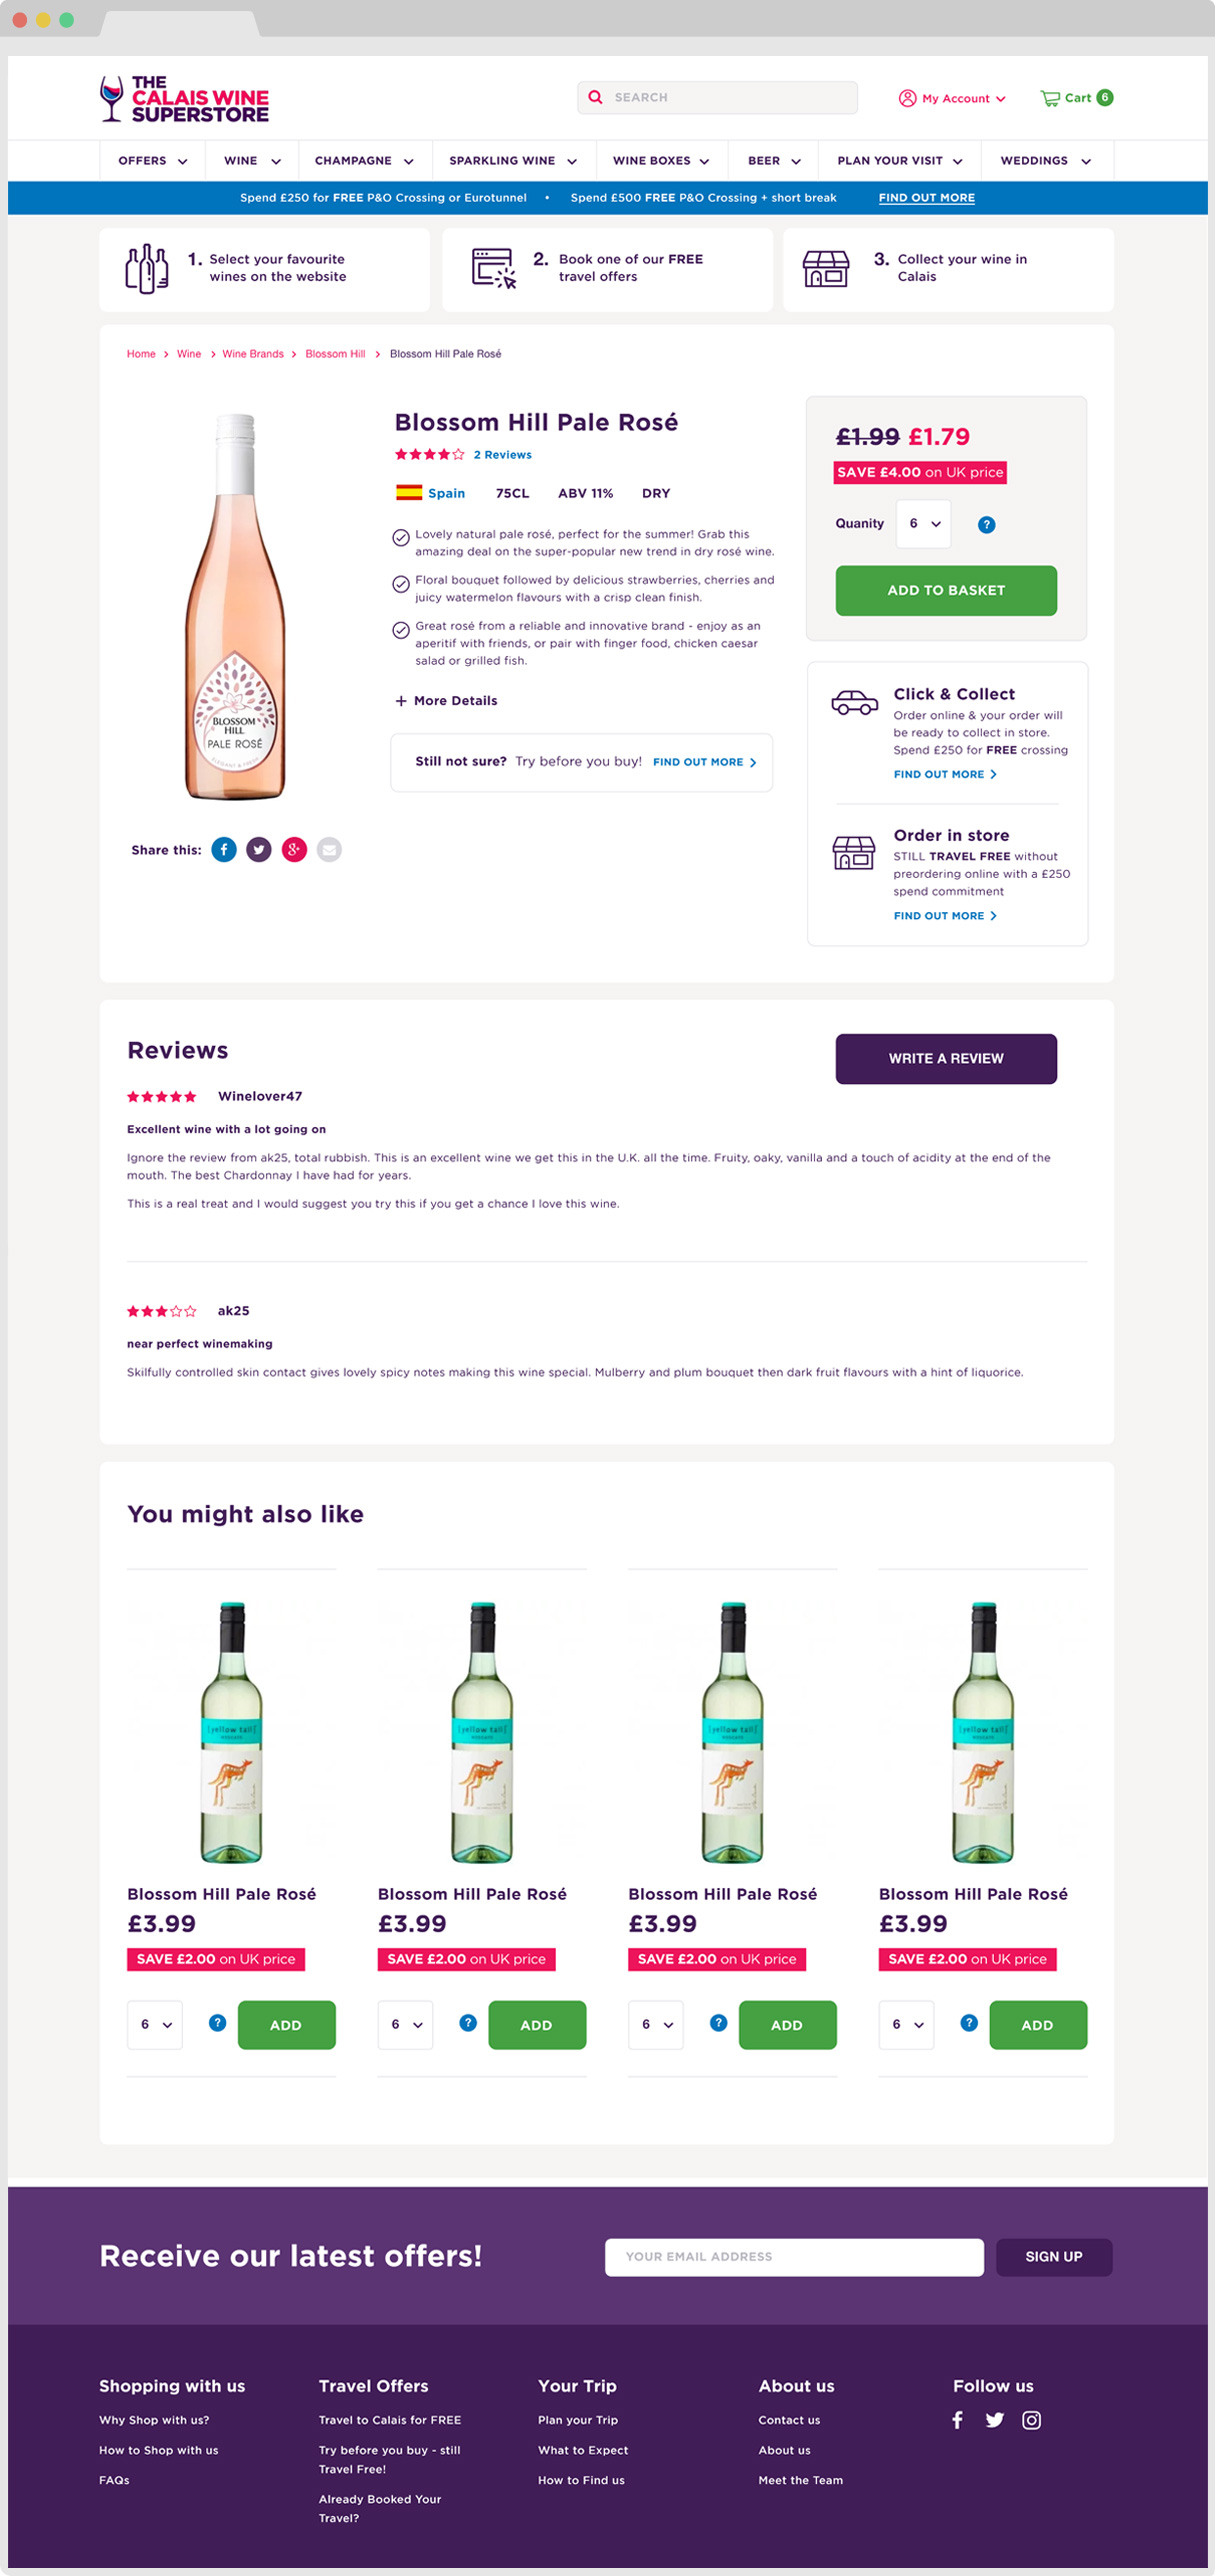 Calais wine product